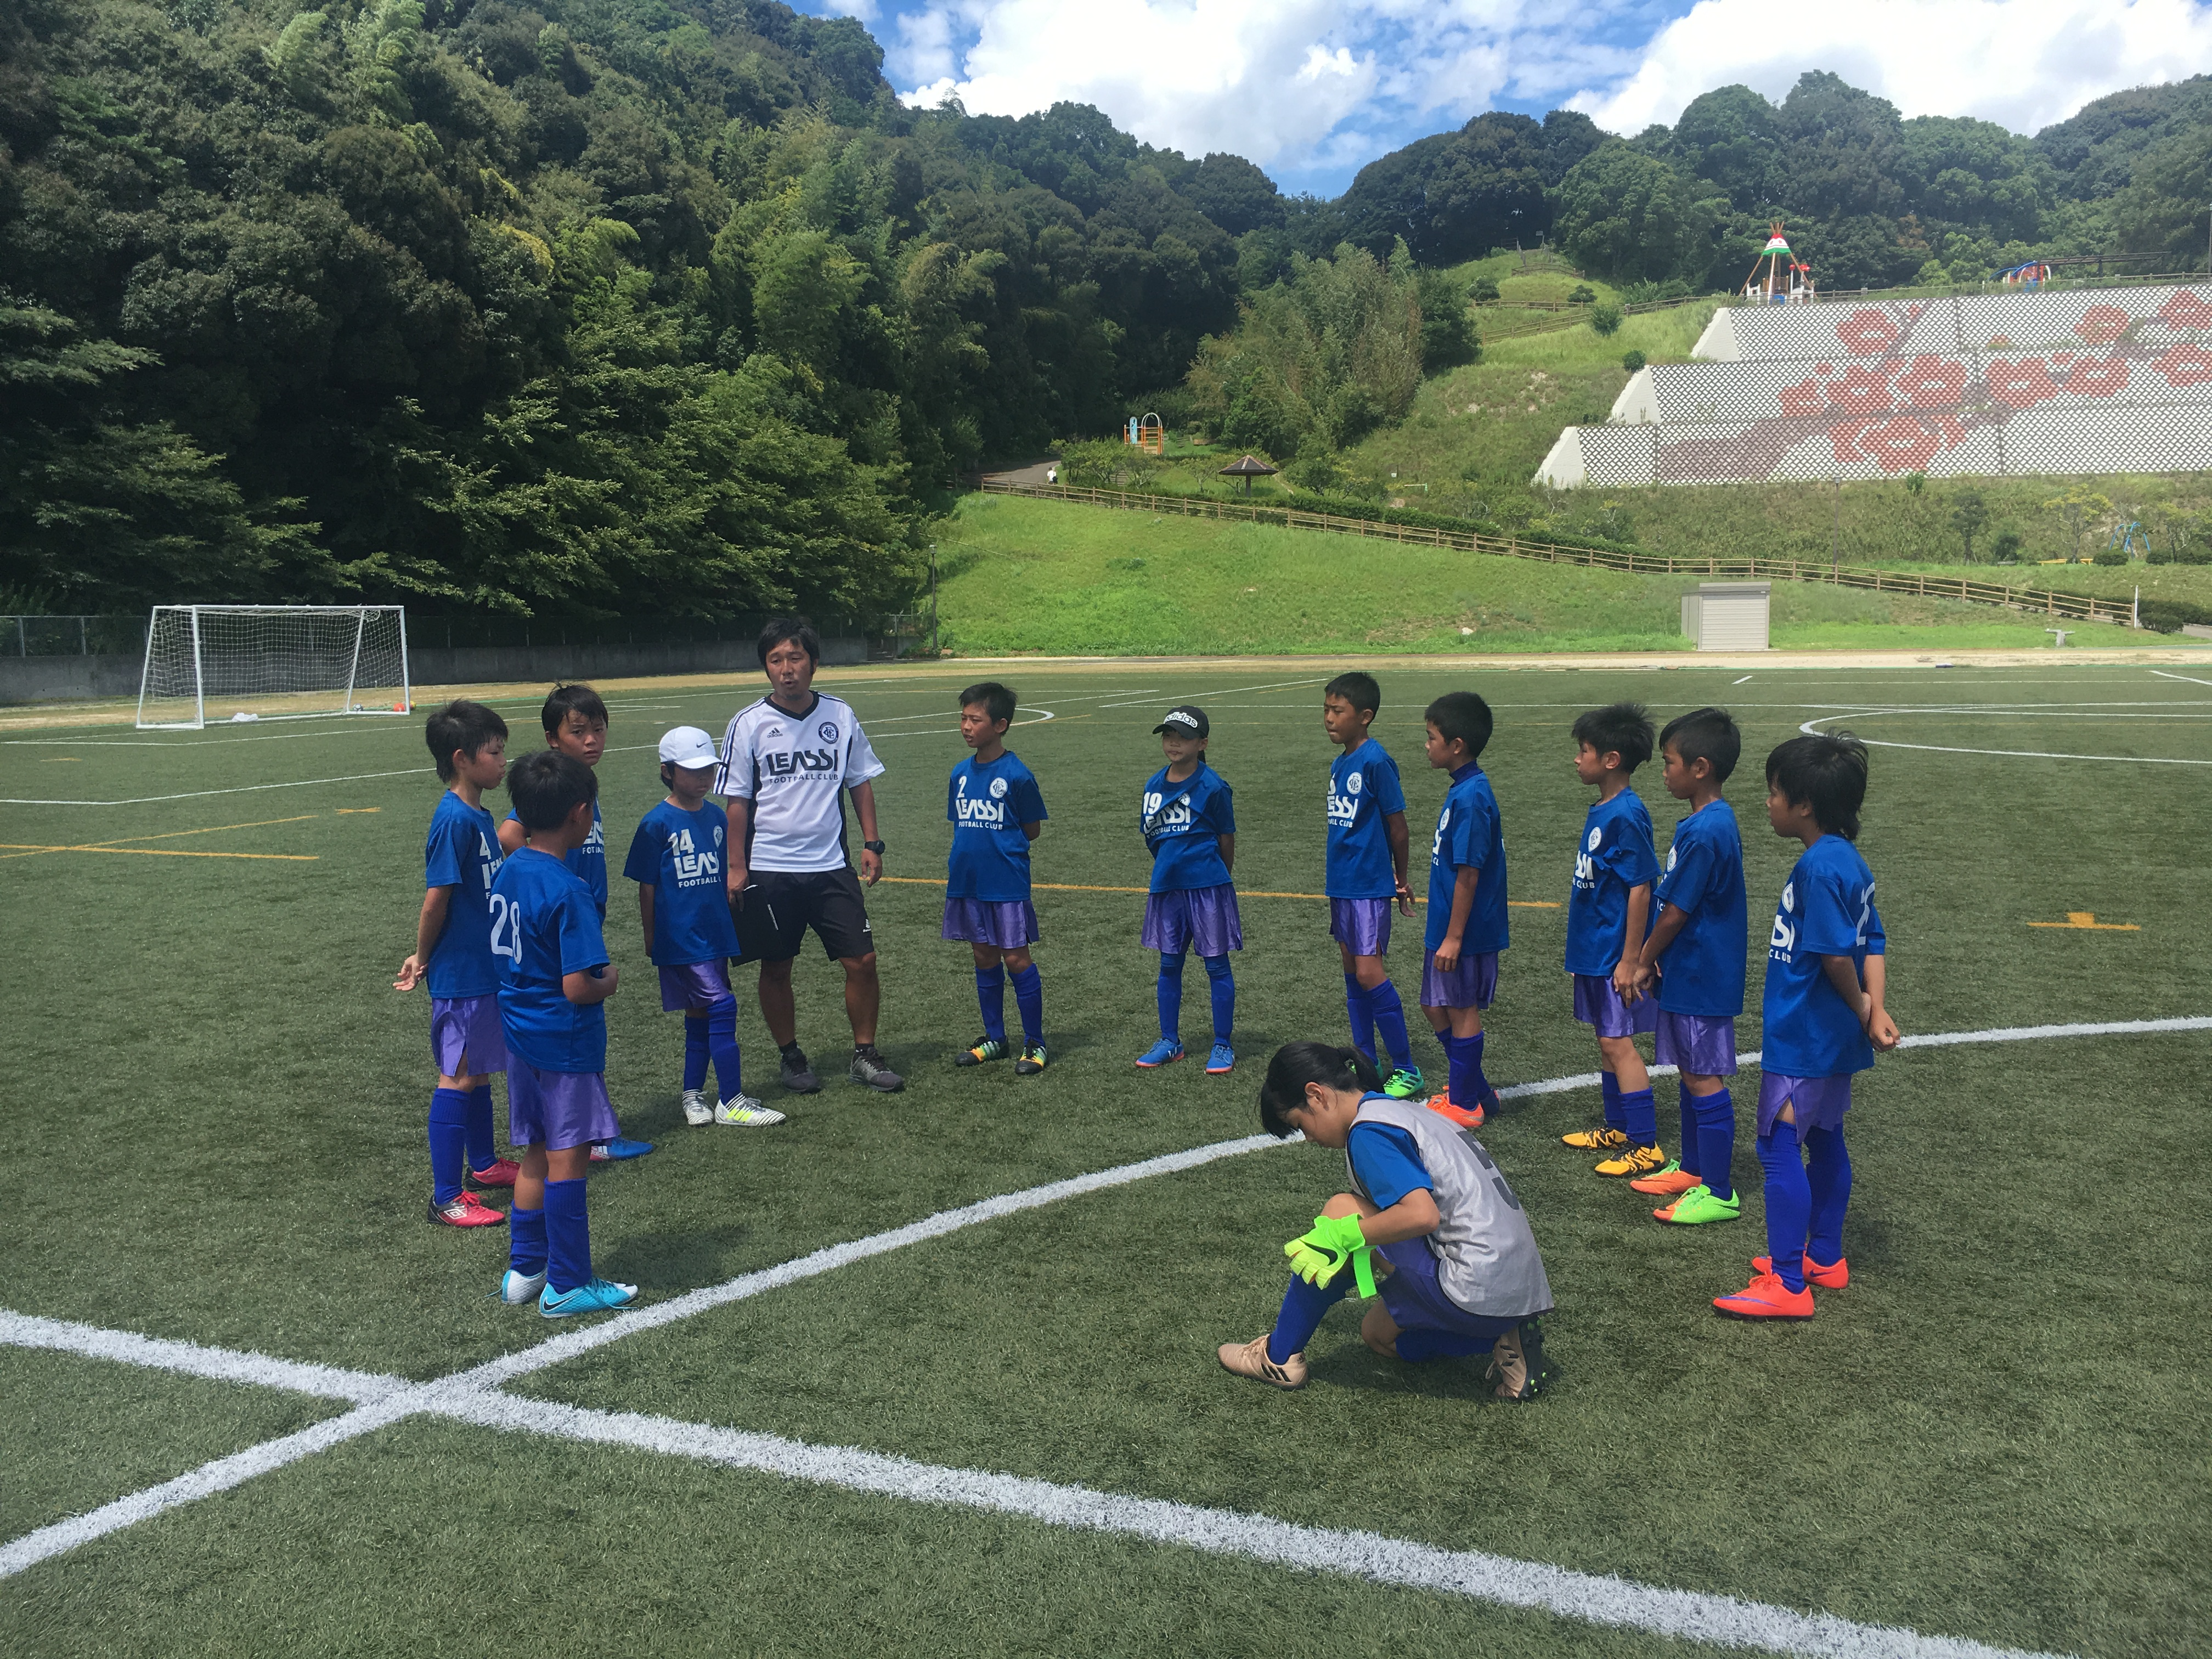 U10 2nd アルバフットボールフェスタ 1日目 2日目